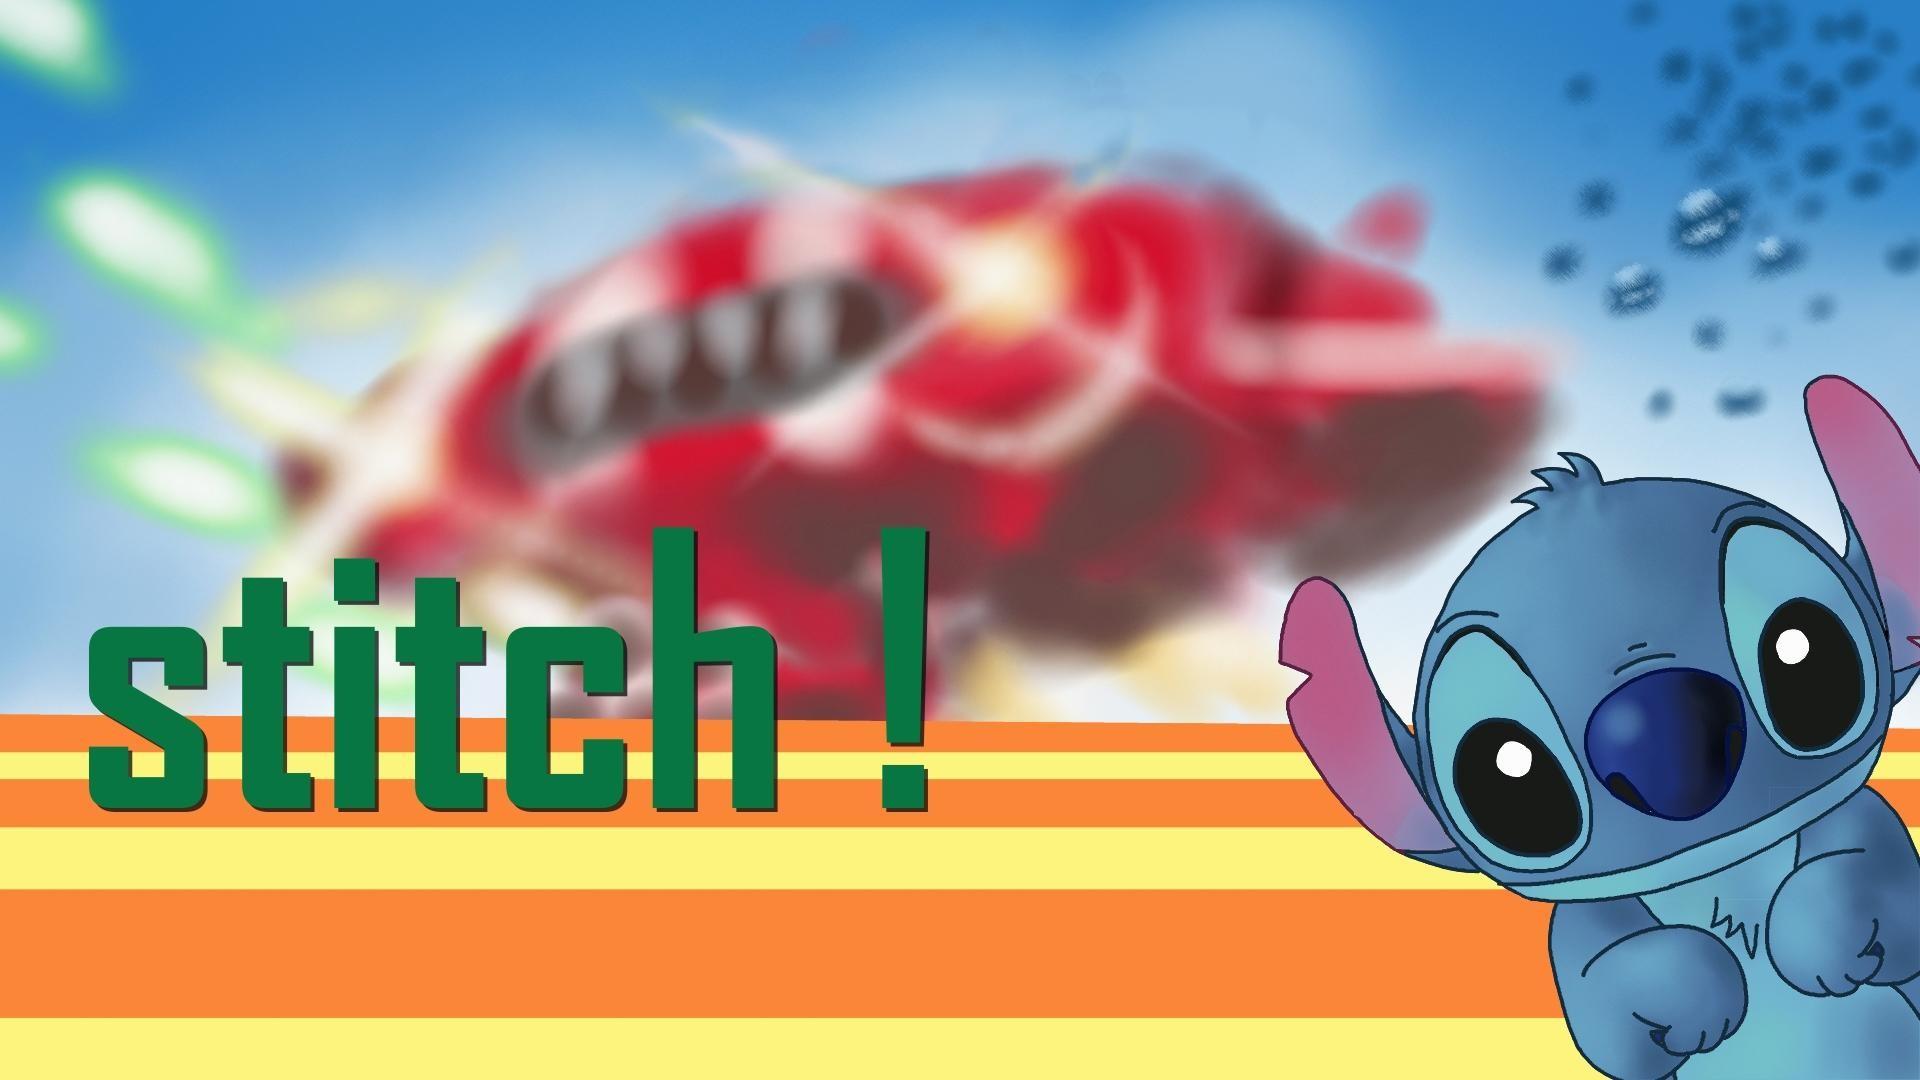 Stitch-lilo-and-stitch-wallpapers-HD